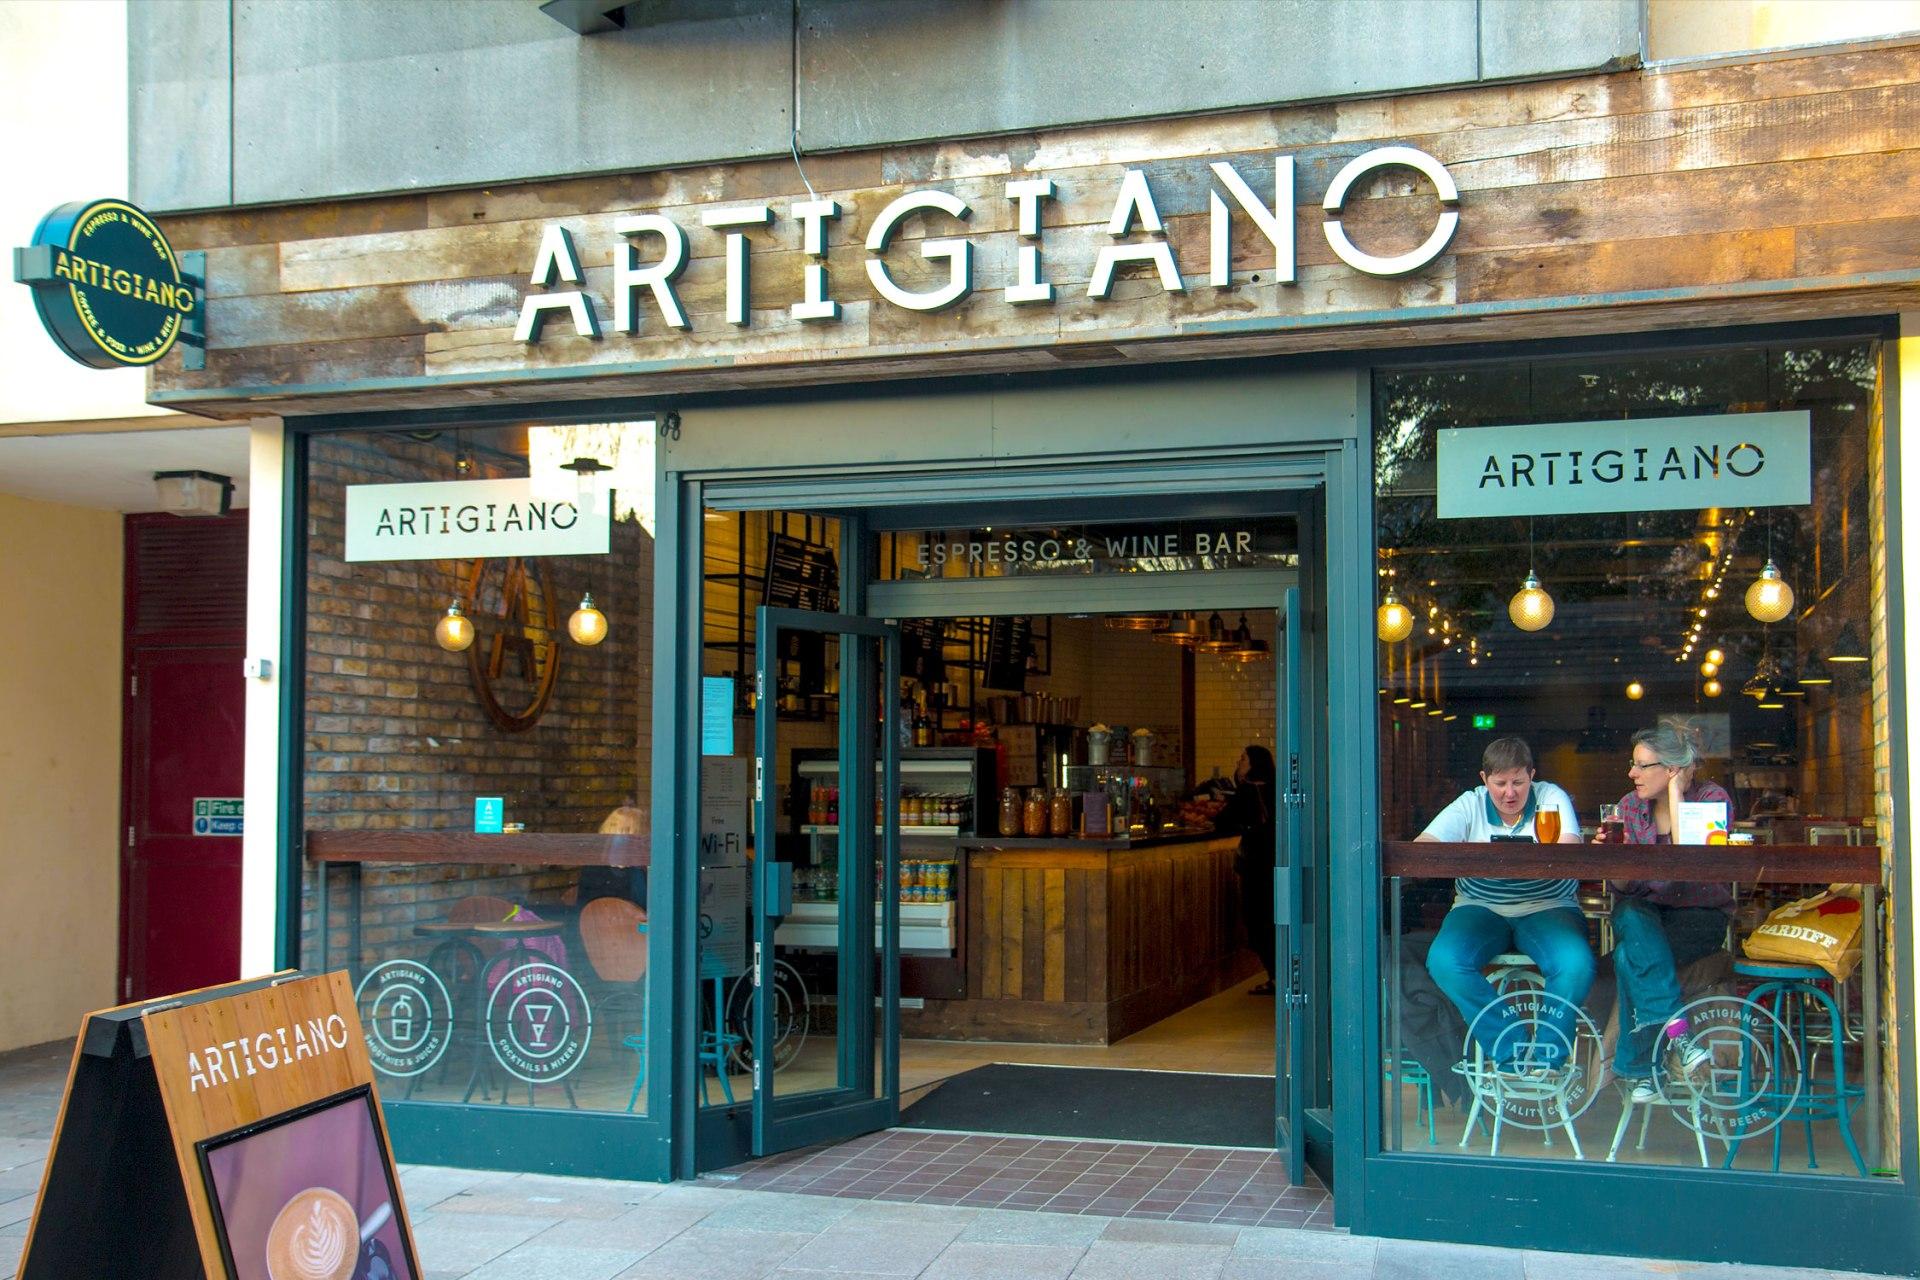 RG1 networking Artigiano